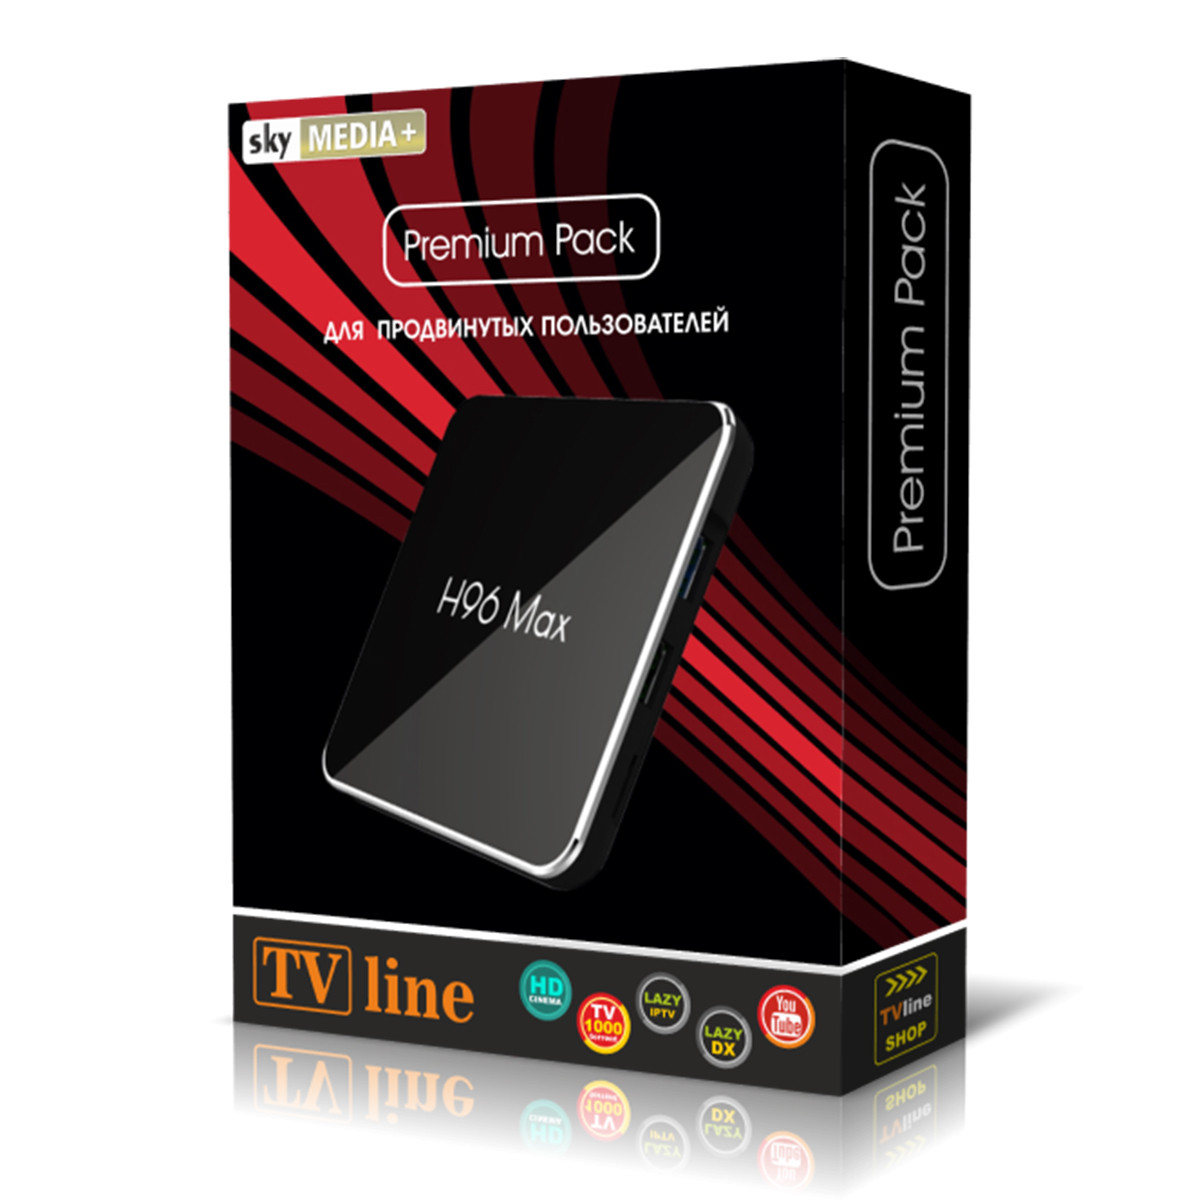 Установочный пакет (Premium Pack) для Android TV Box